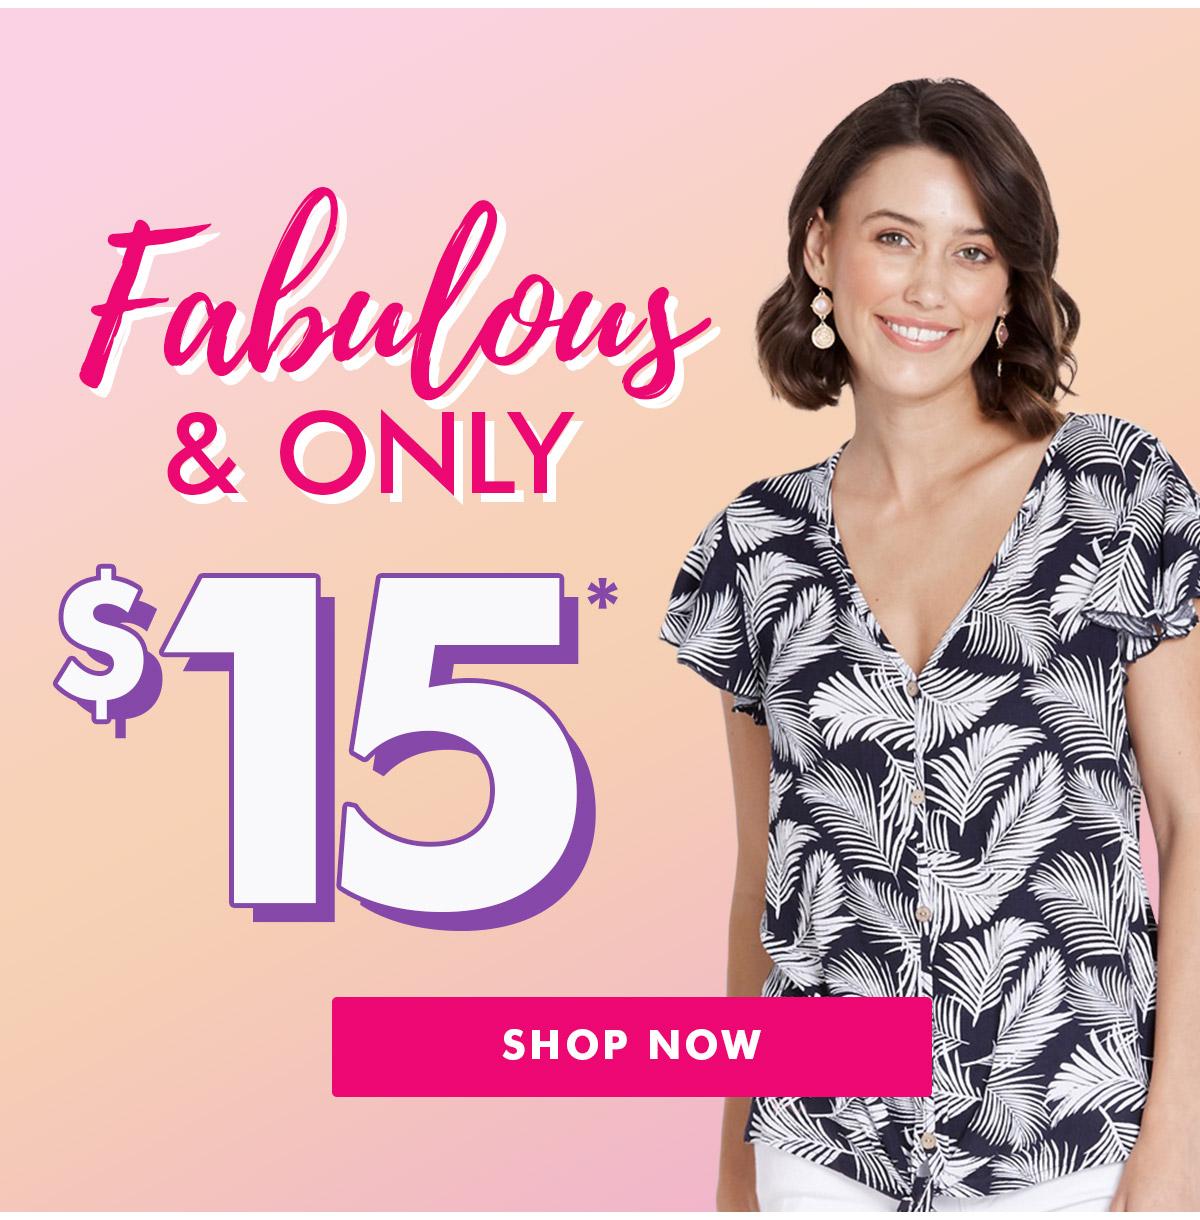 Fabulous $15 Styles!